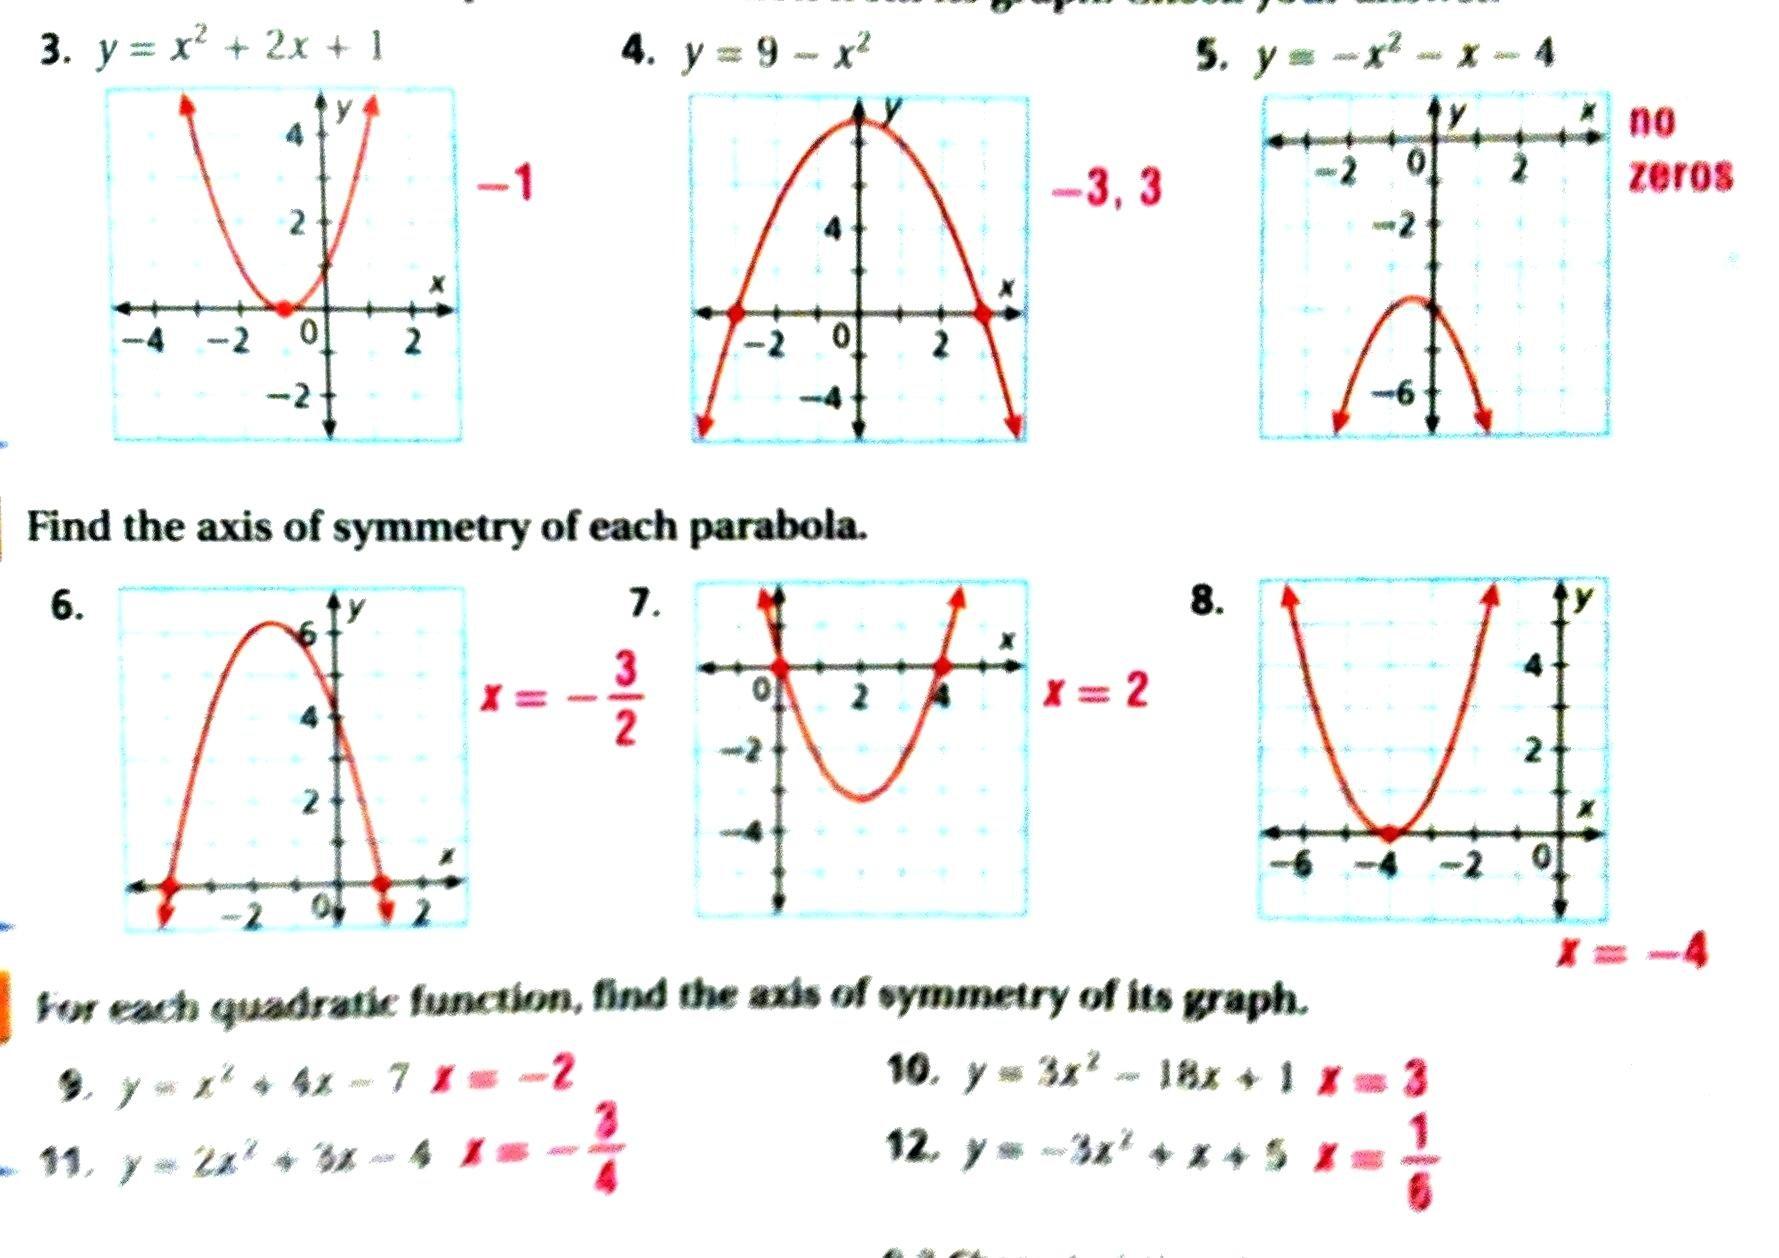 Algebra 1 Quadratic Formula Worksheet Answers Math Characteristics With Regard To Graphing Quadratics Review Worksheet Answers